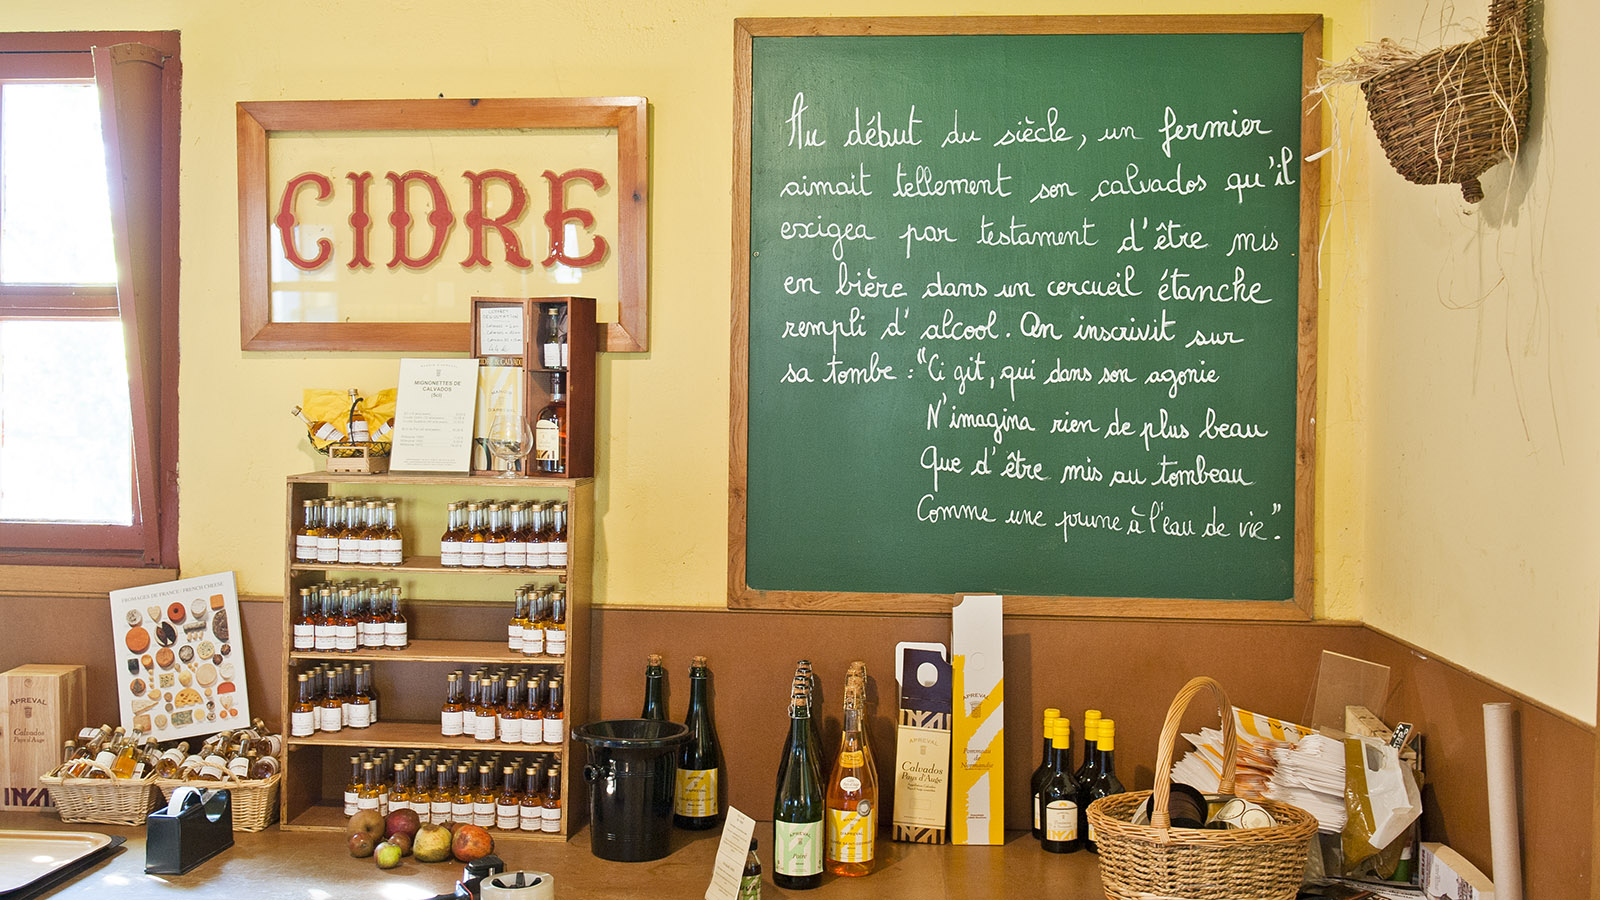 Cidre-Verkauf beim Manoir d'Apreval. Foto: Hilke Maunder